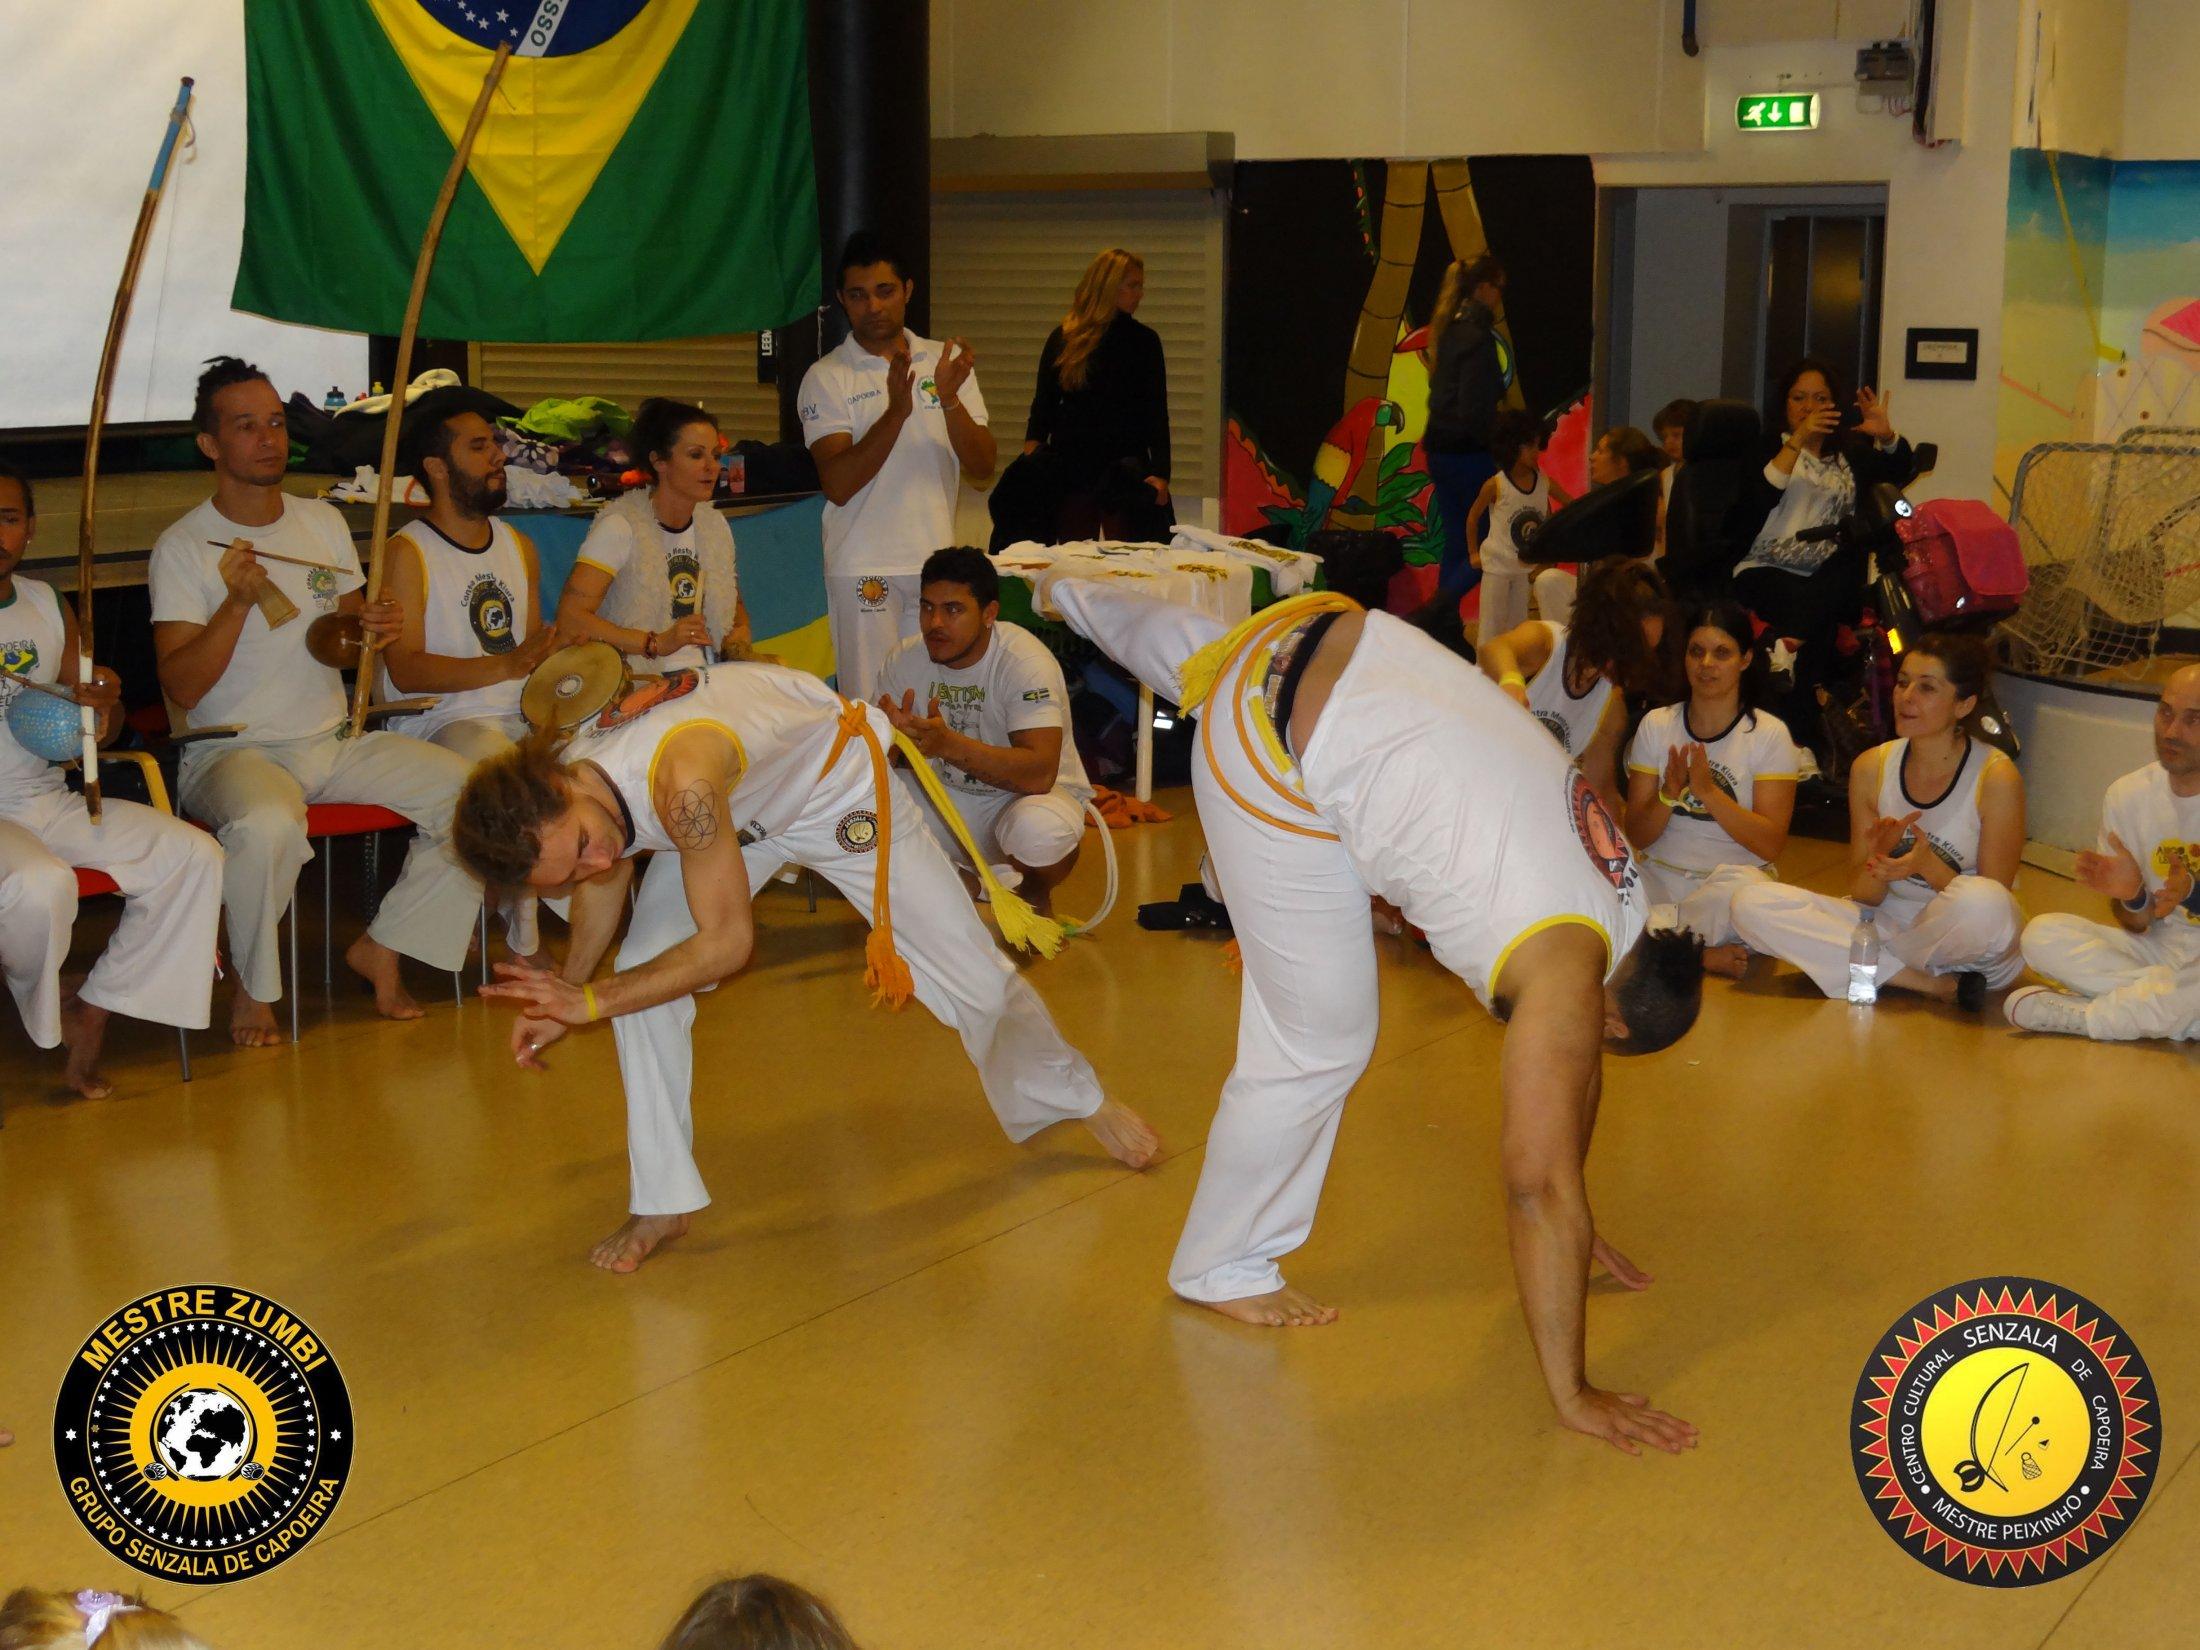 2013-12-14 - Capoeira 097